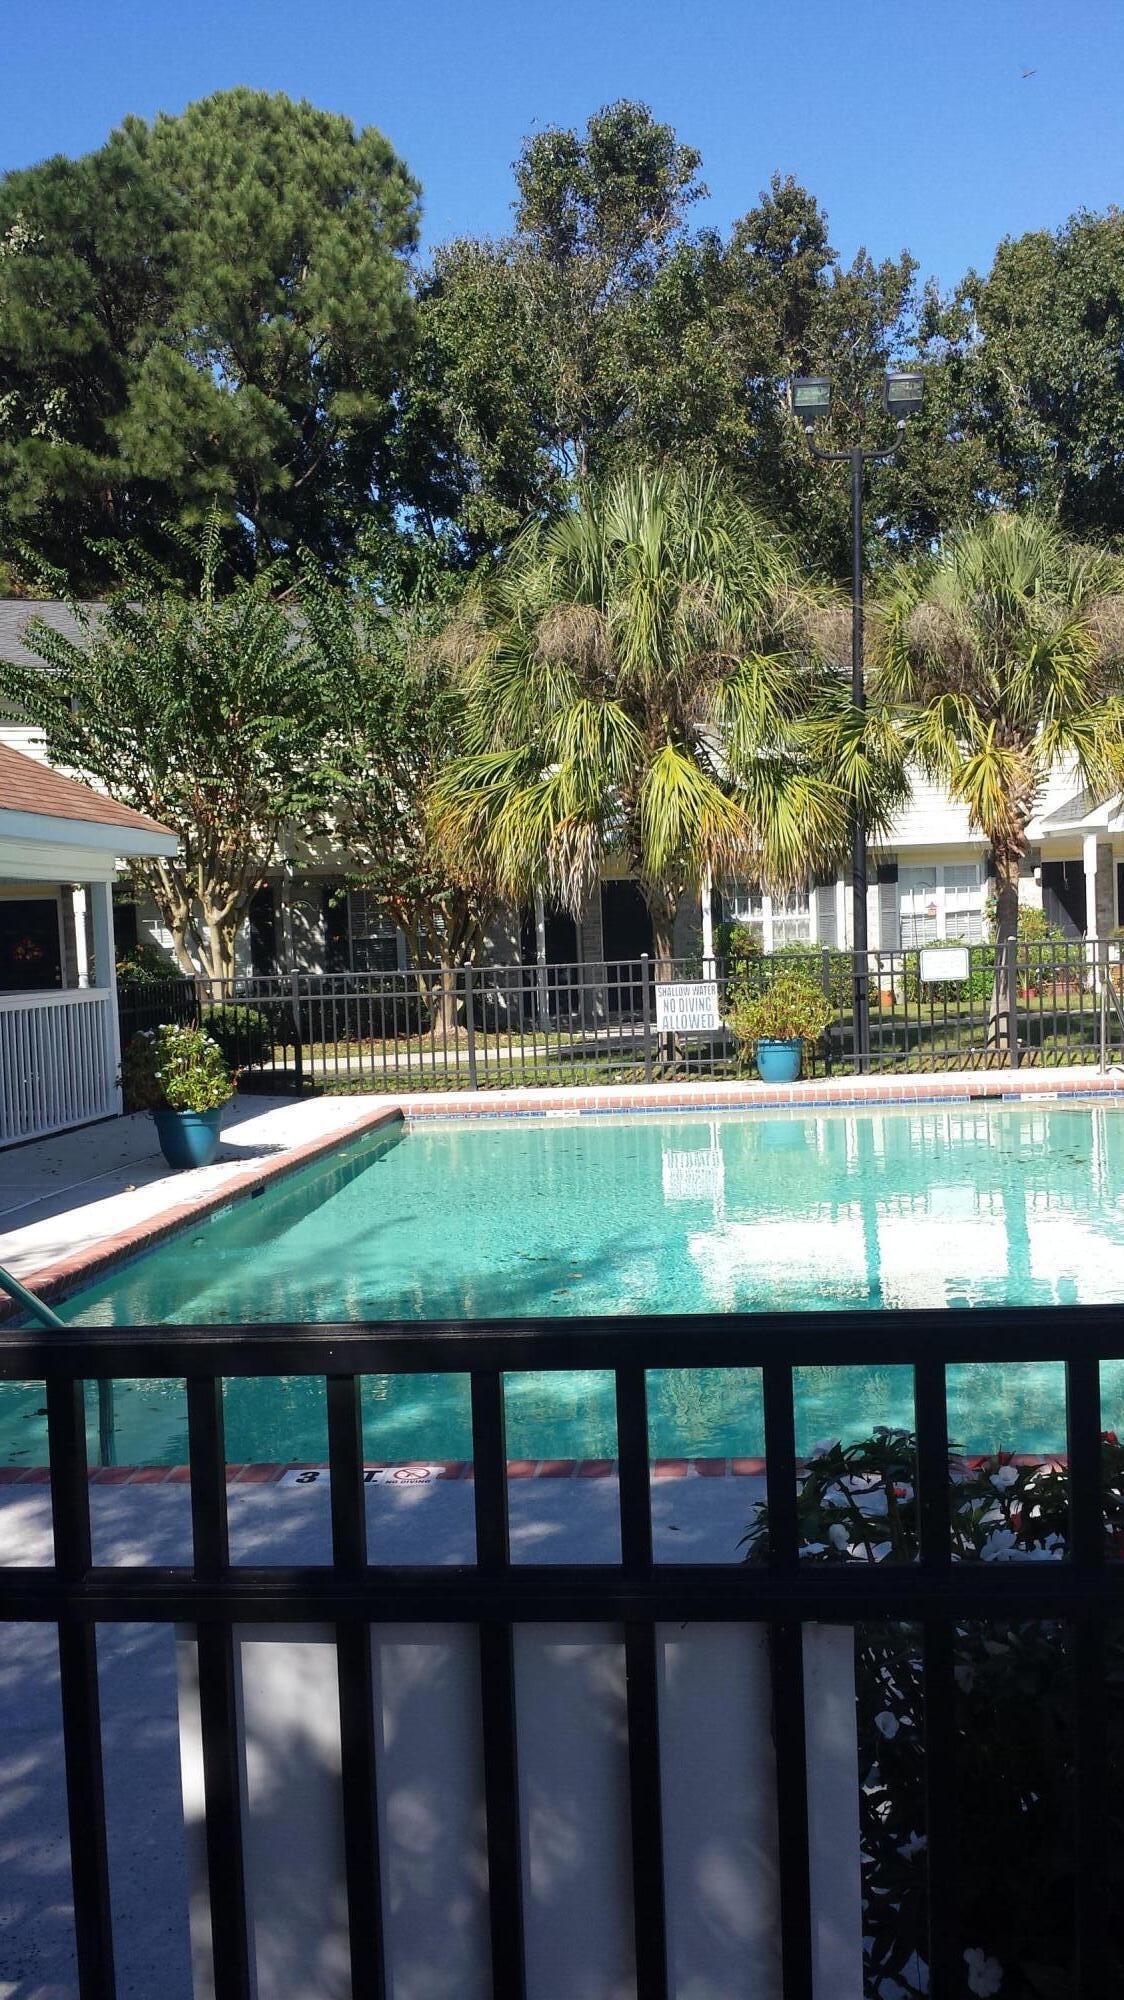 Wildwood Town Homes Homes For Sale - 507 Stinson, Charleston, SC - 0